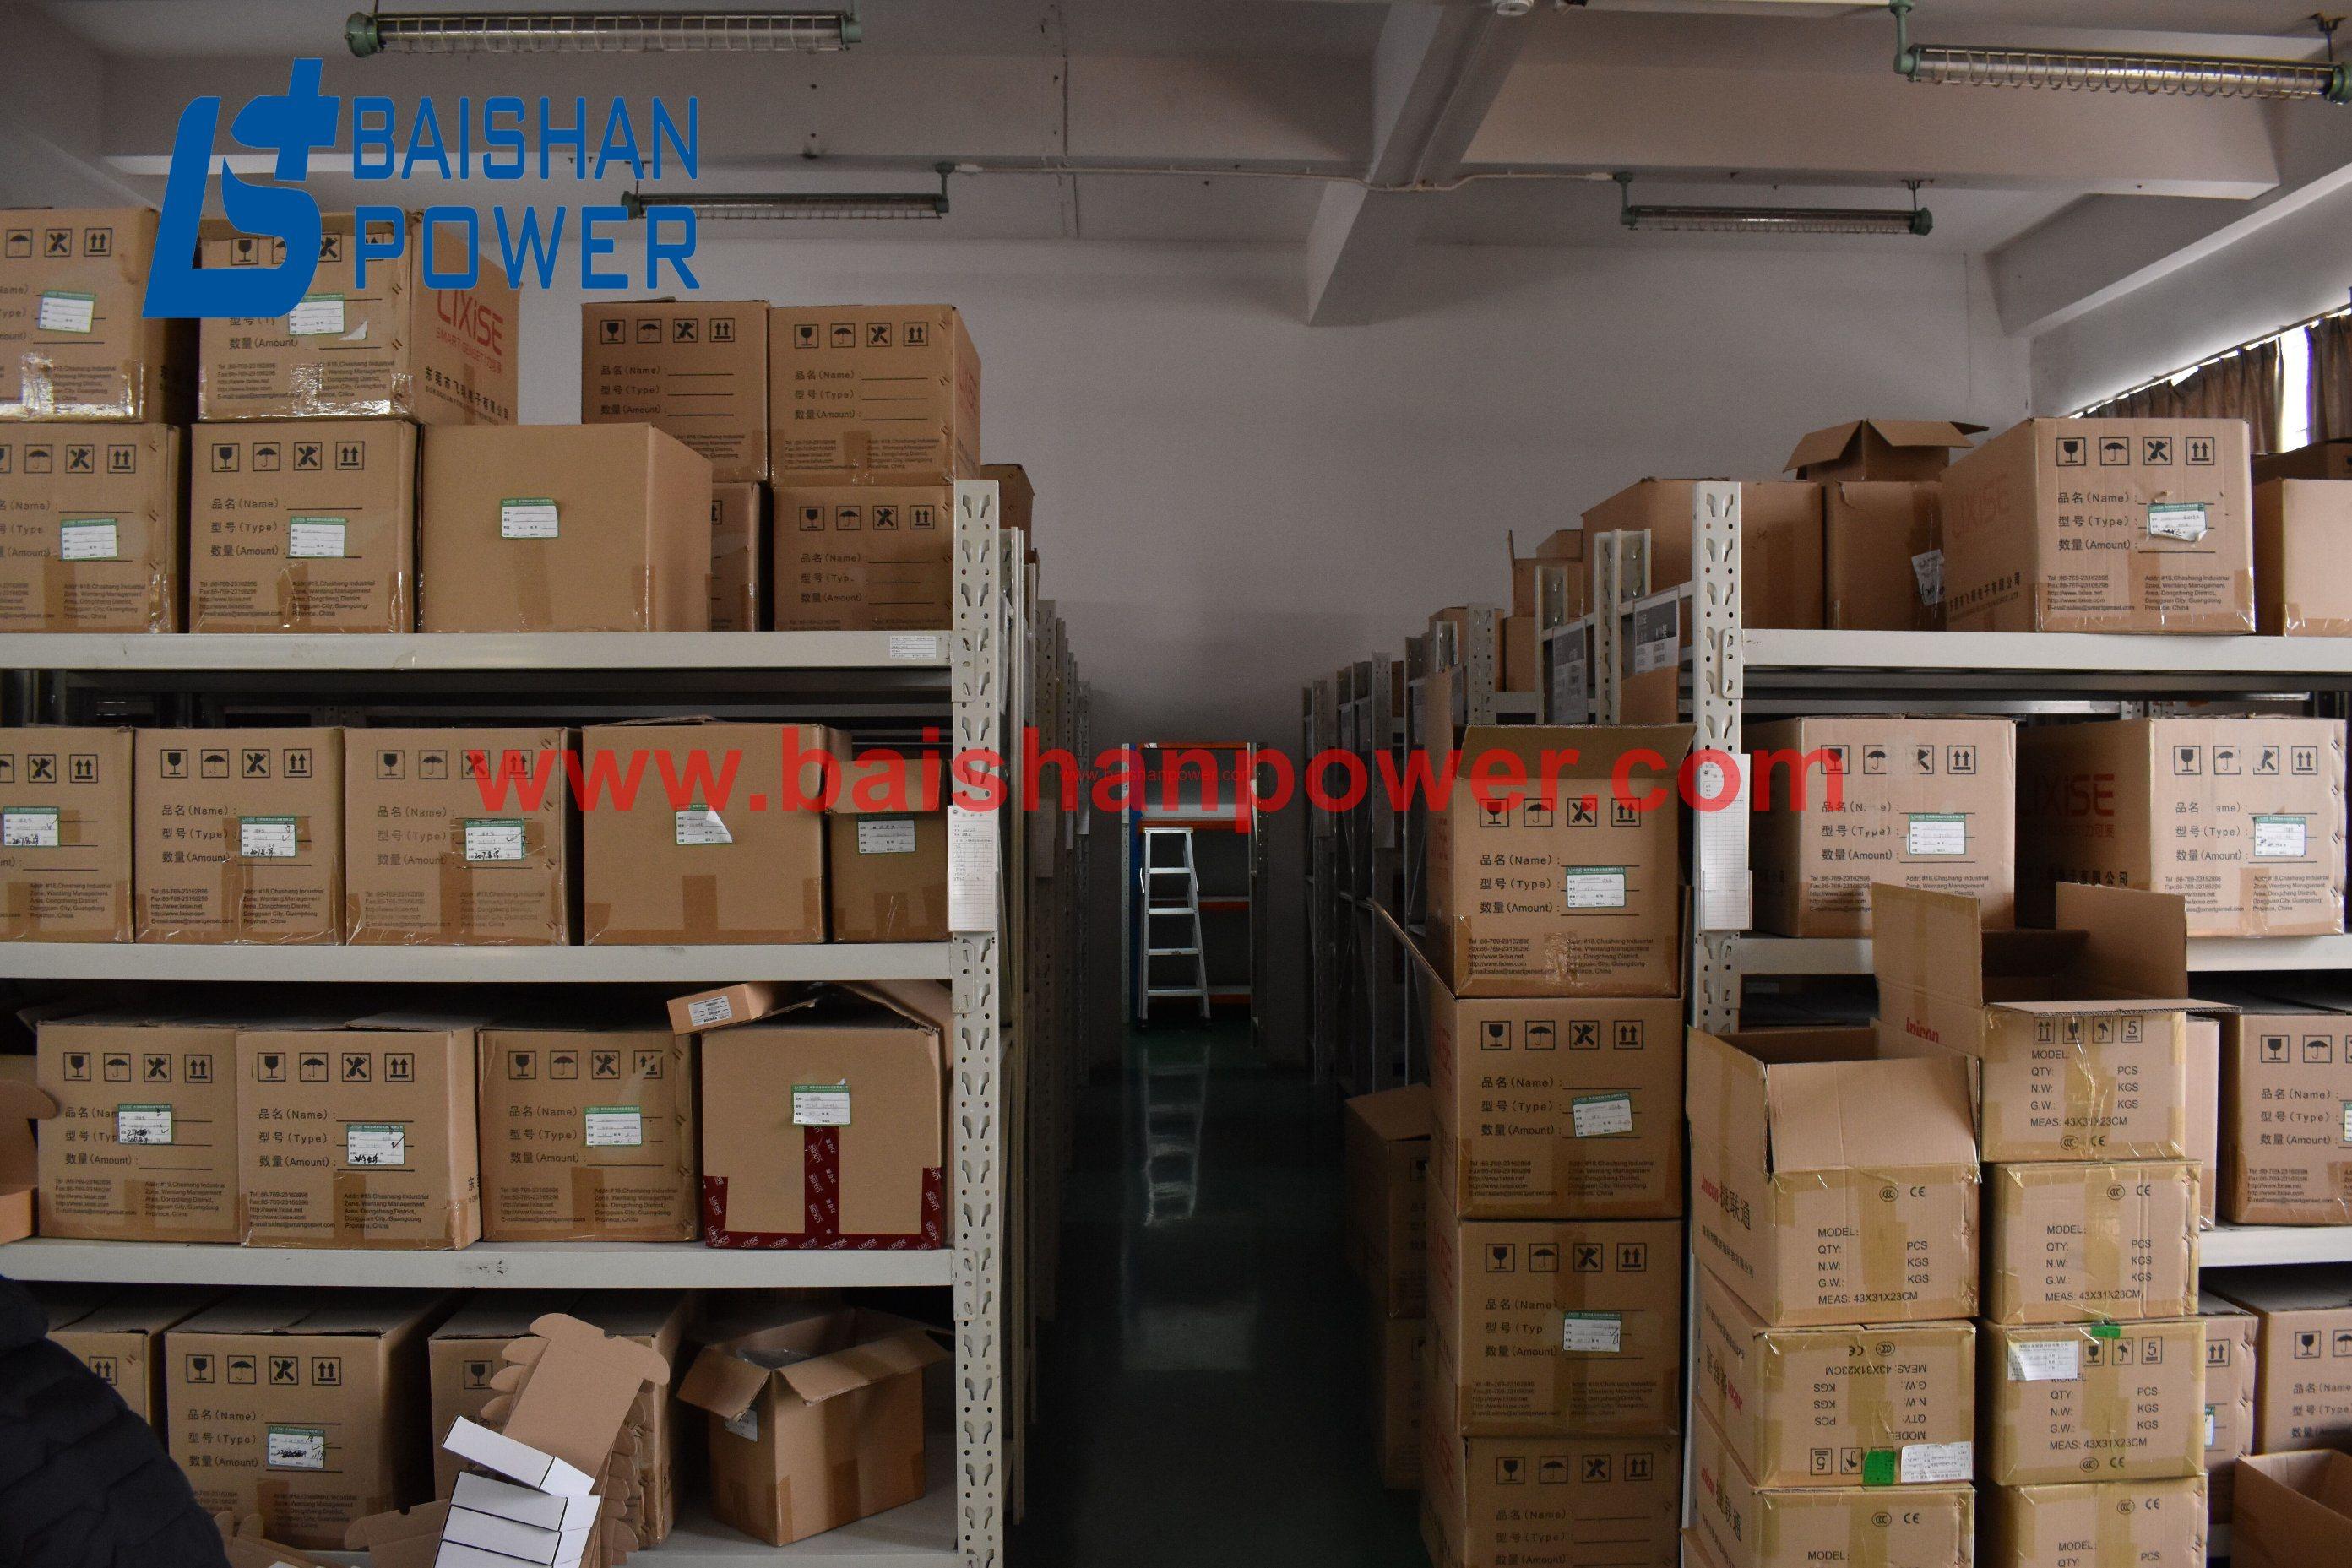 Stable Olympian Dataline Woodward 8923-1061, Digital Fg Wilson Generator on